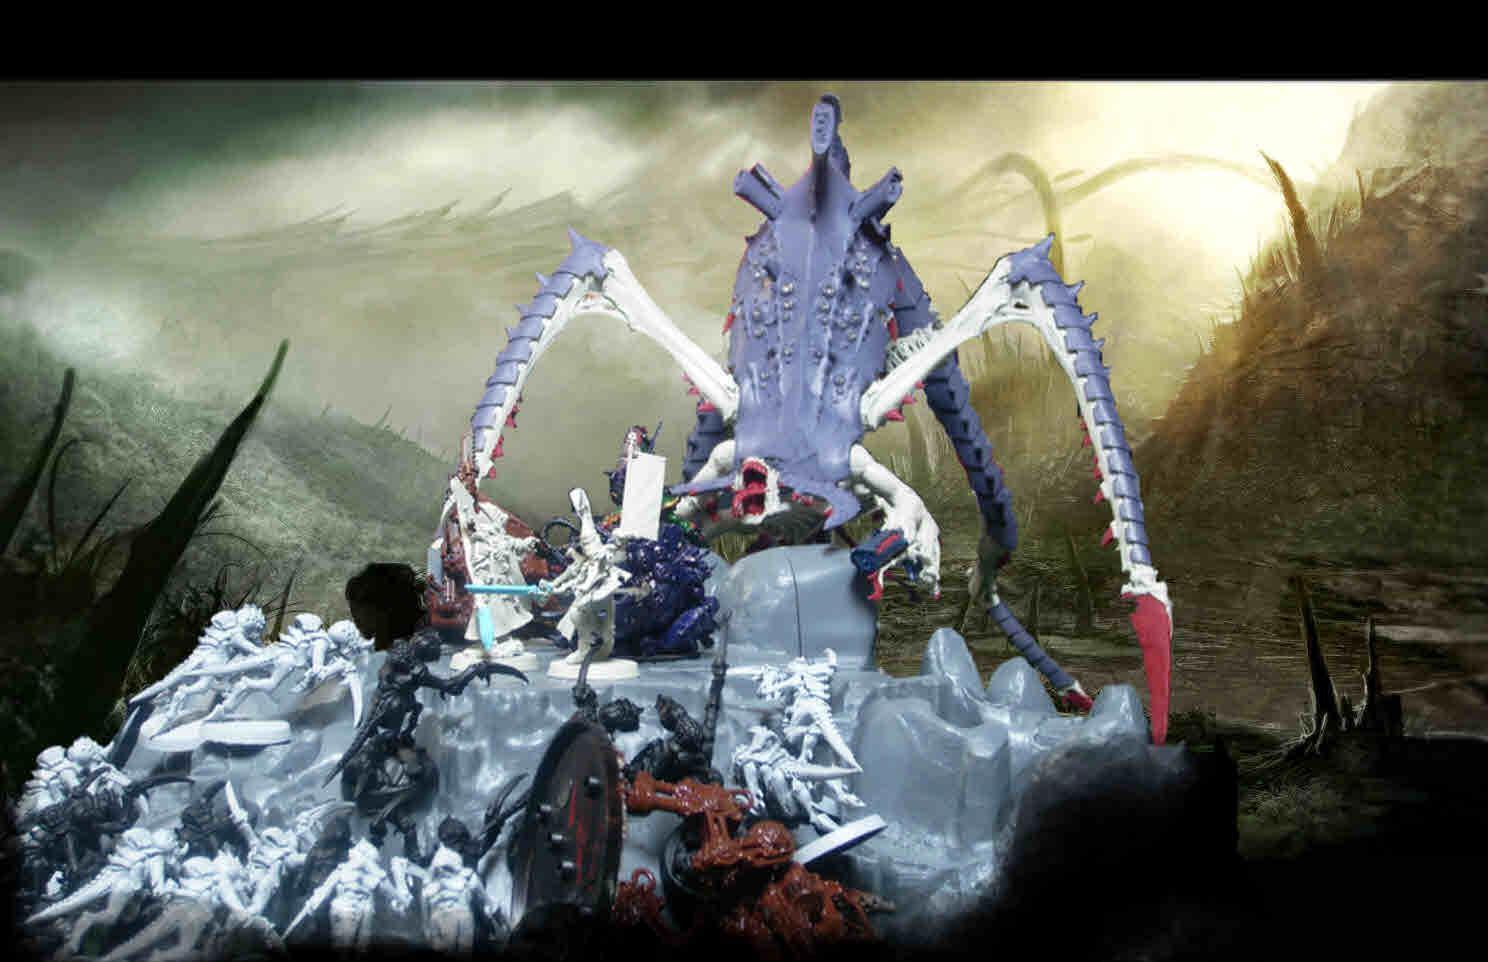 Aspect, Aspect Warrior, Conversion, Eldar, Genestealer, Hierophant, Karandras, Khaine, Leviathan, Phoenix, Predator, Scorpion, Shadows, Striking Scorpions, Swarm, Symbiont, Tyranids, W40k, Warhammer 40,000, Warriors